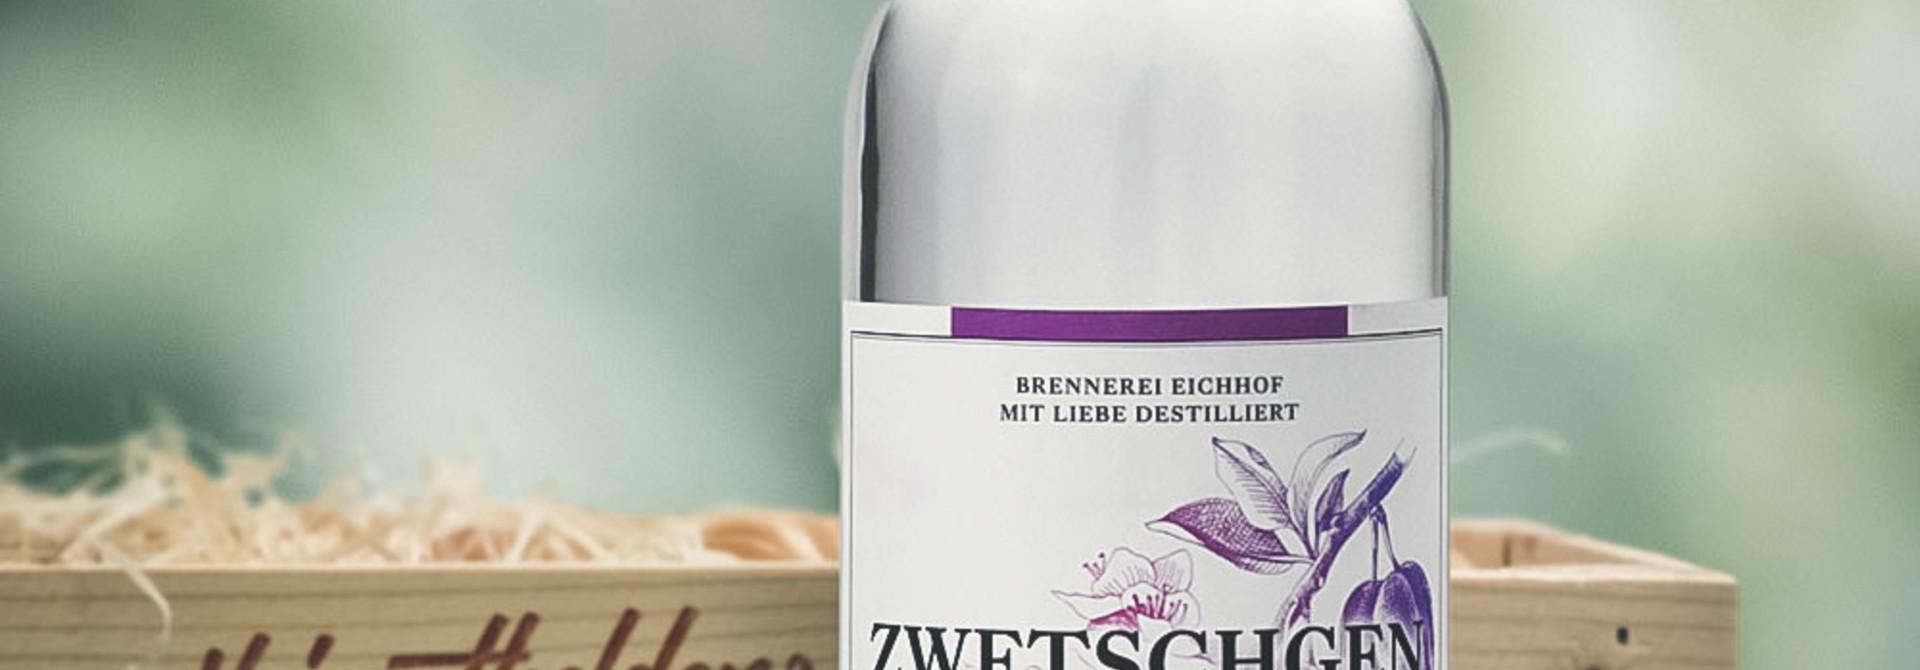 Zwetschgen Wasser 70cl in attraktiver Geschenk-Holzharasse